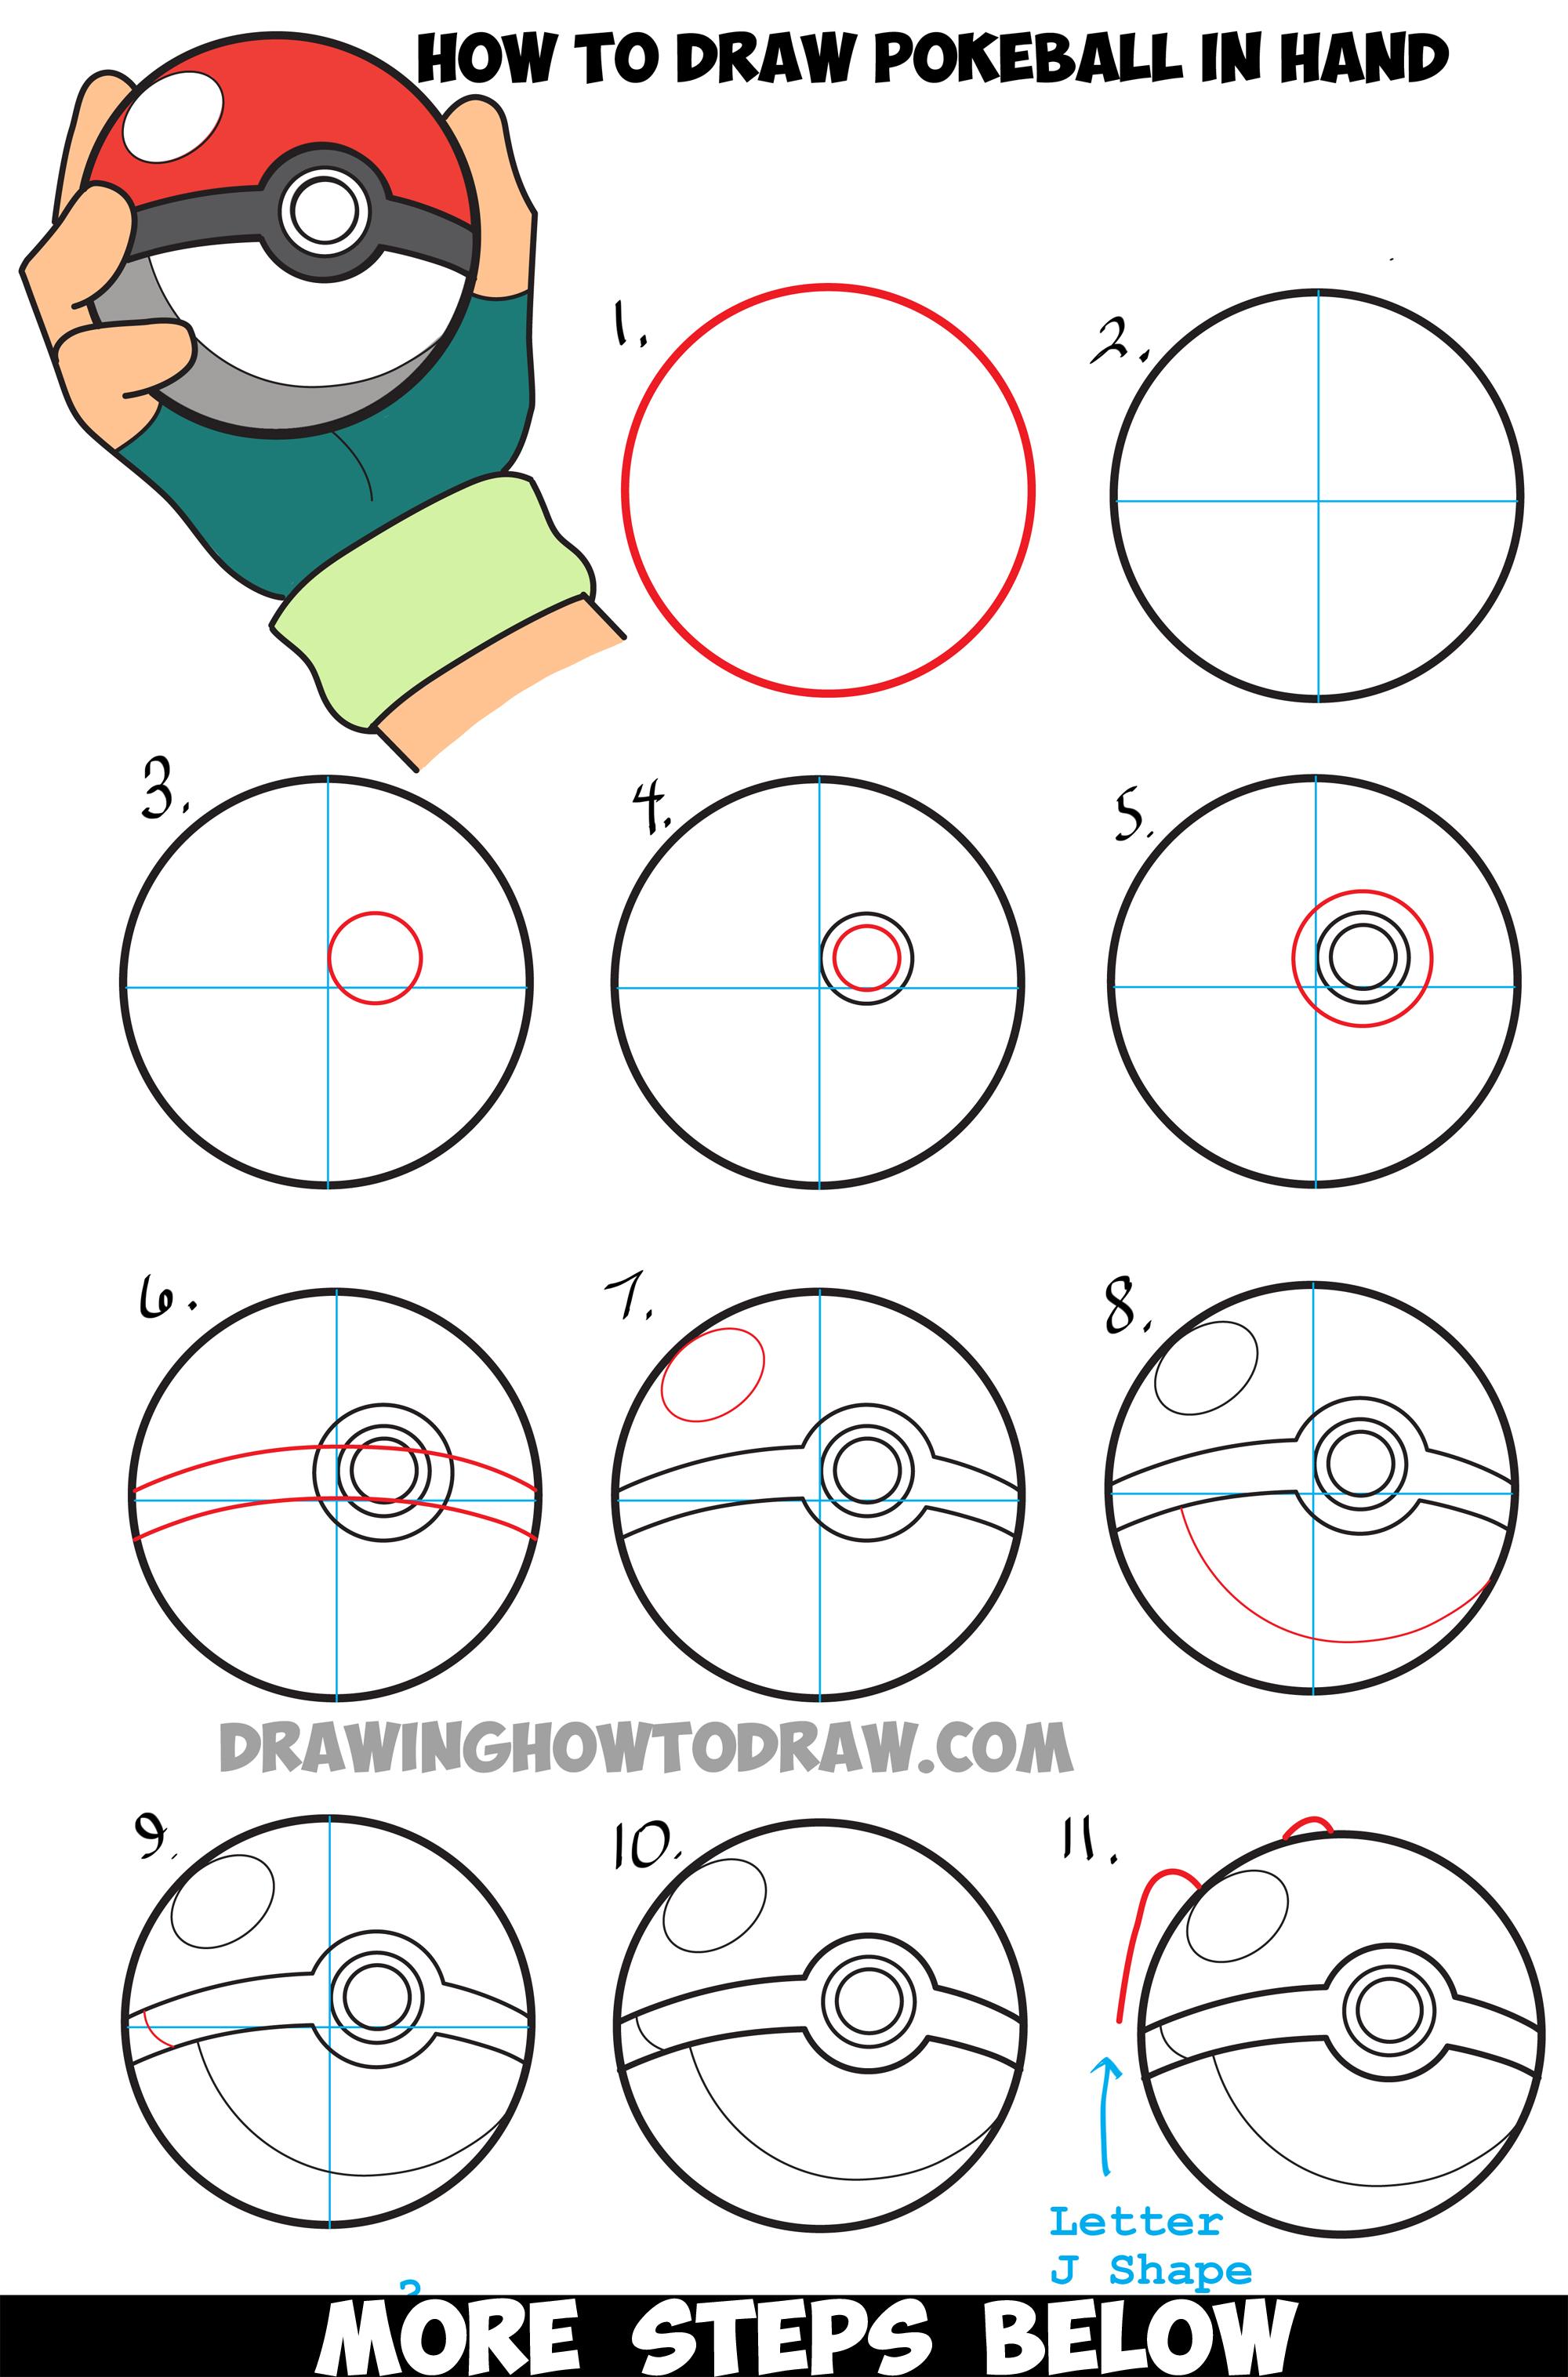 Drawn pokeball drawing Step in Drawing Hand Pokemon